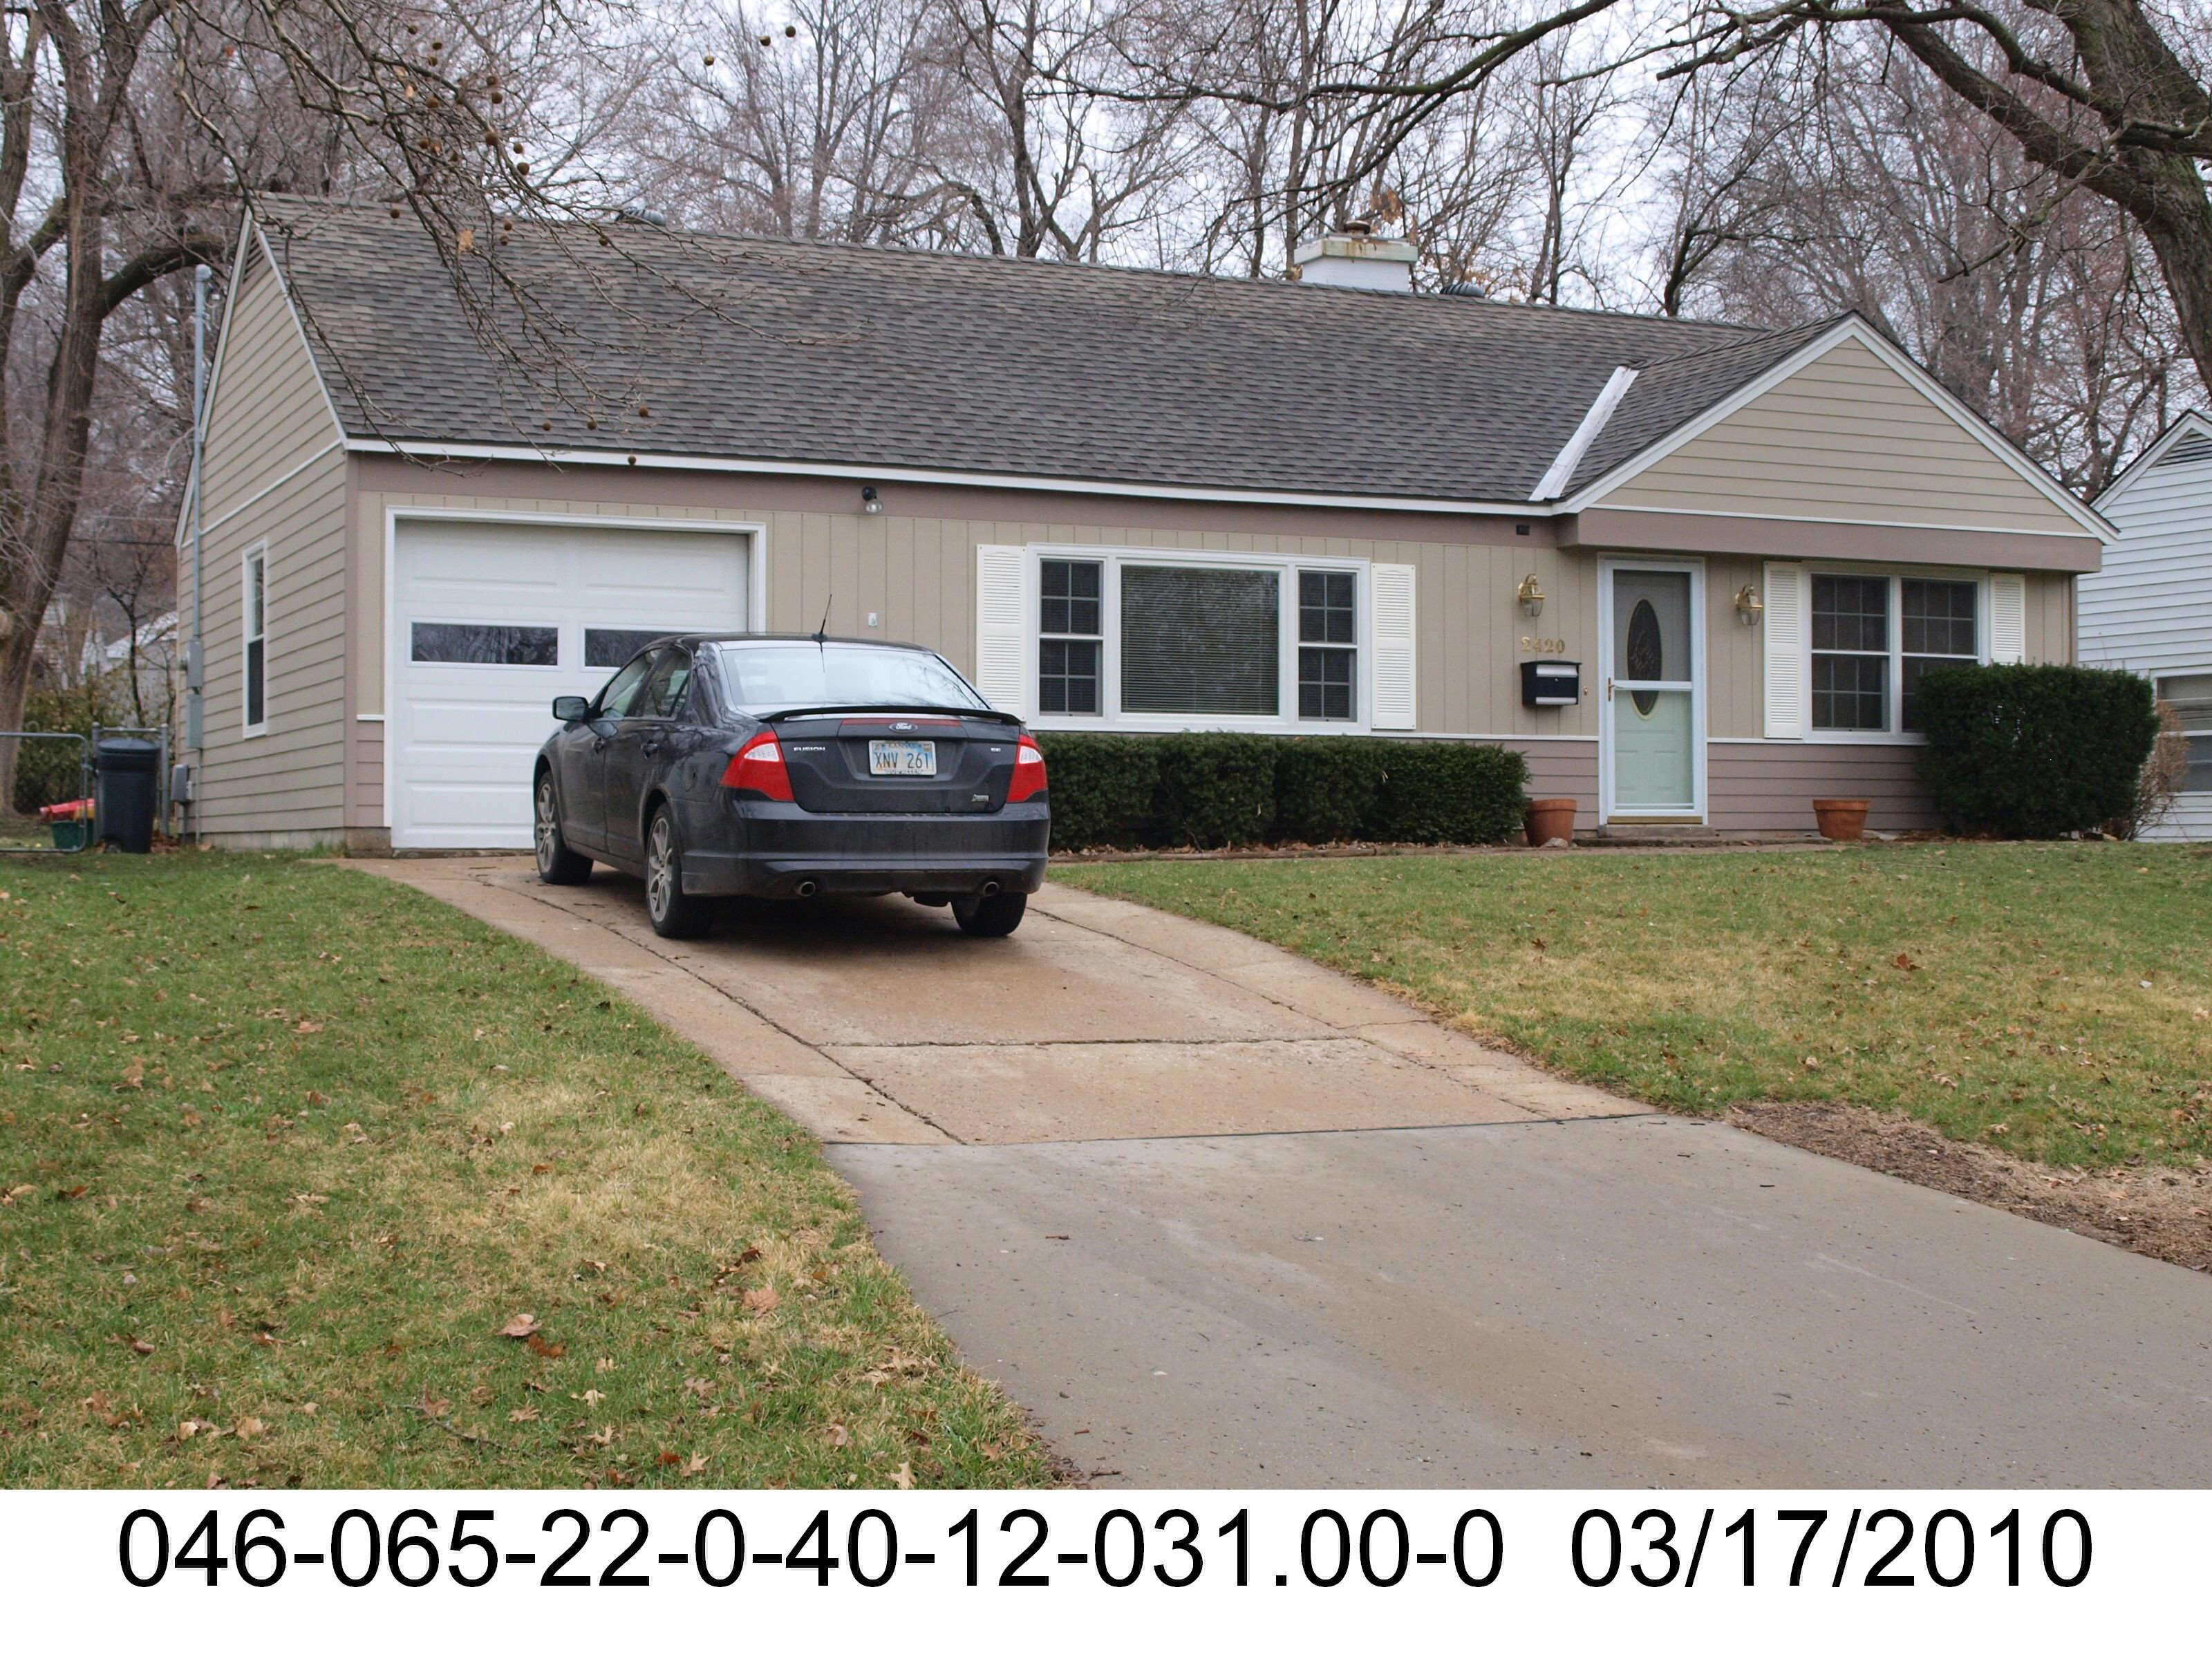 Kansas johnson county prairie village -  116 218 Property In Prairie Village Kansas